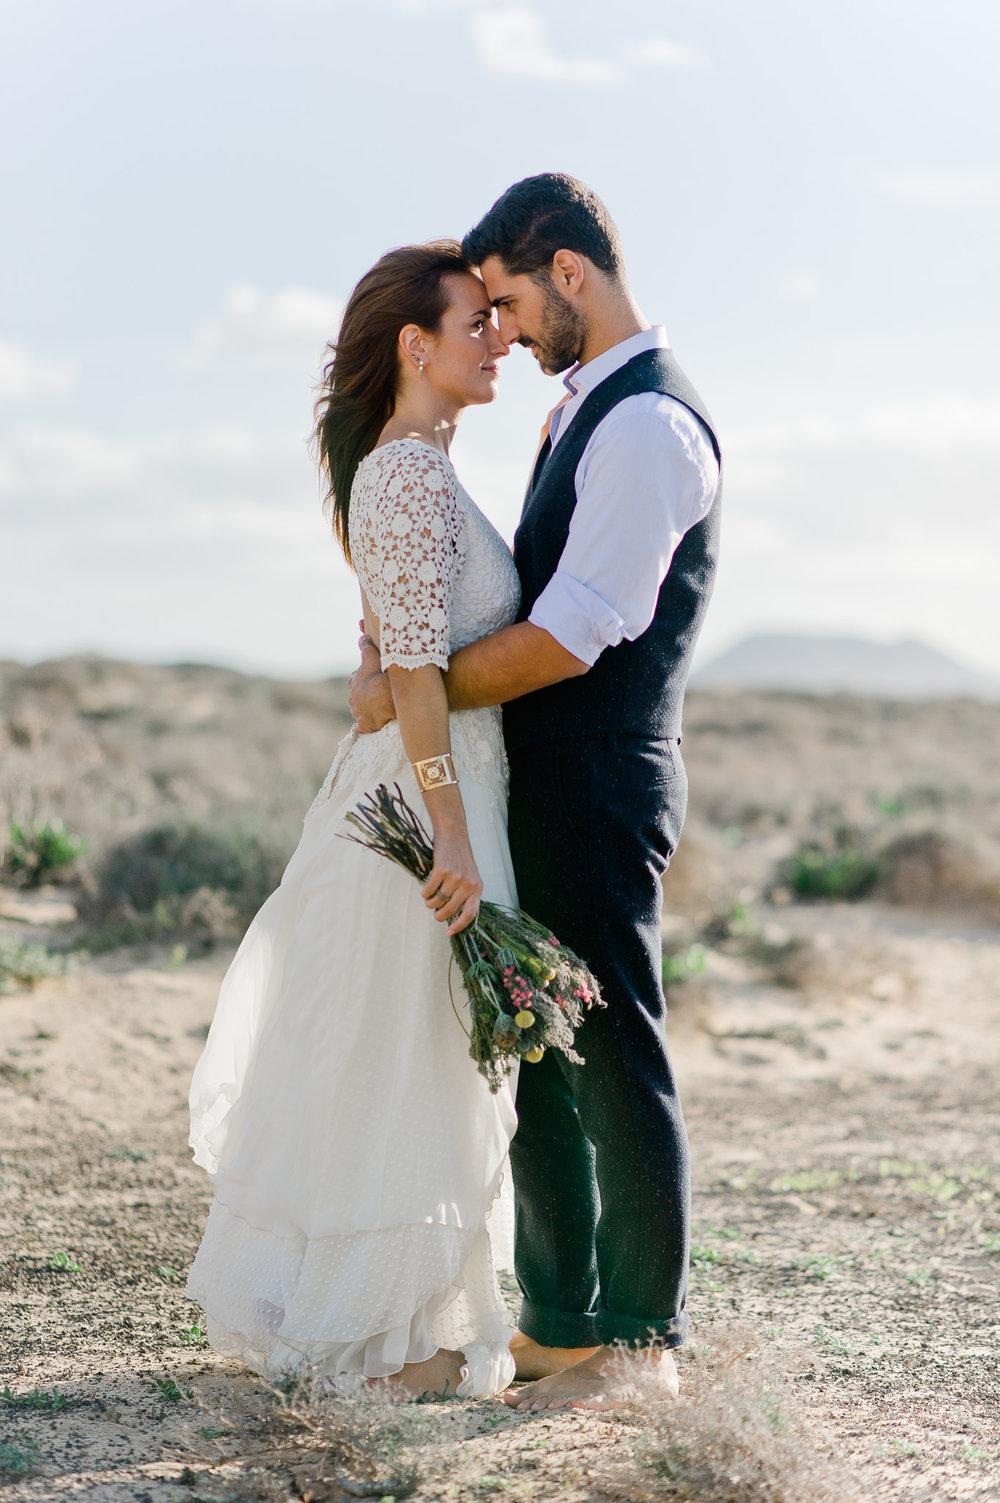 anna hari wedding photography-33.jpg